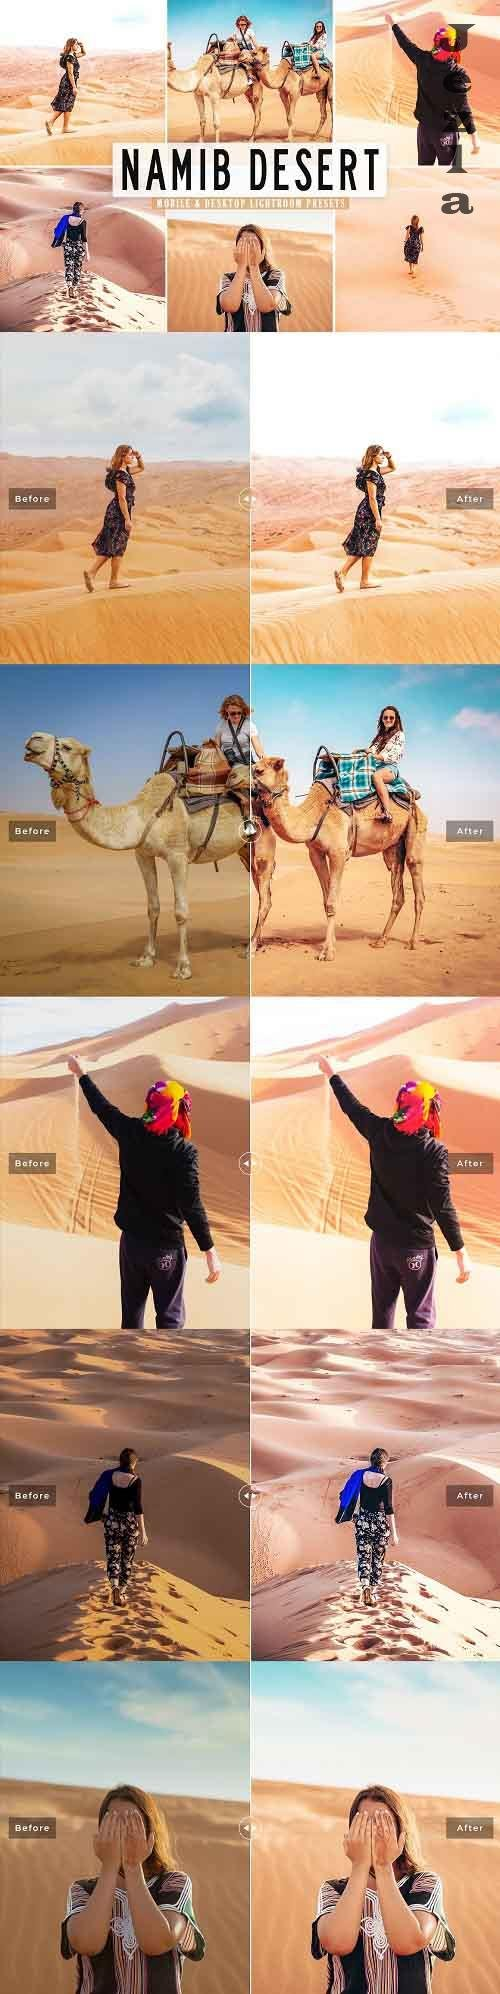 Namib Desert Pro Lightroom Presets - 5478841 - Mobile & Desktop